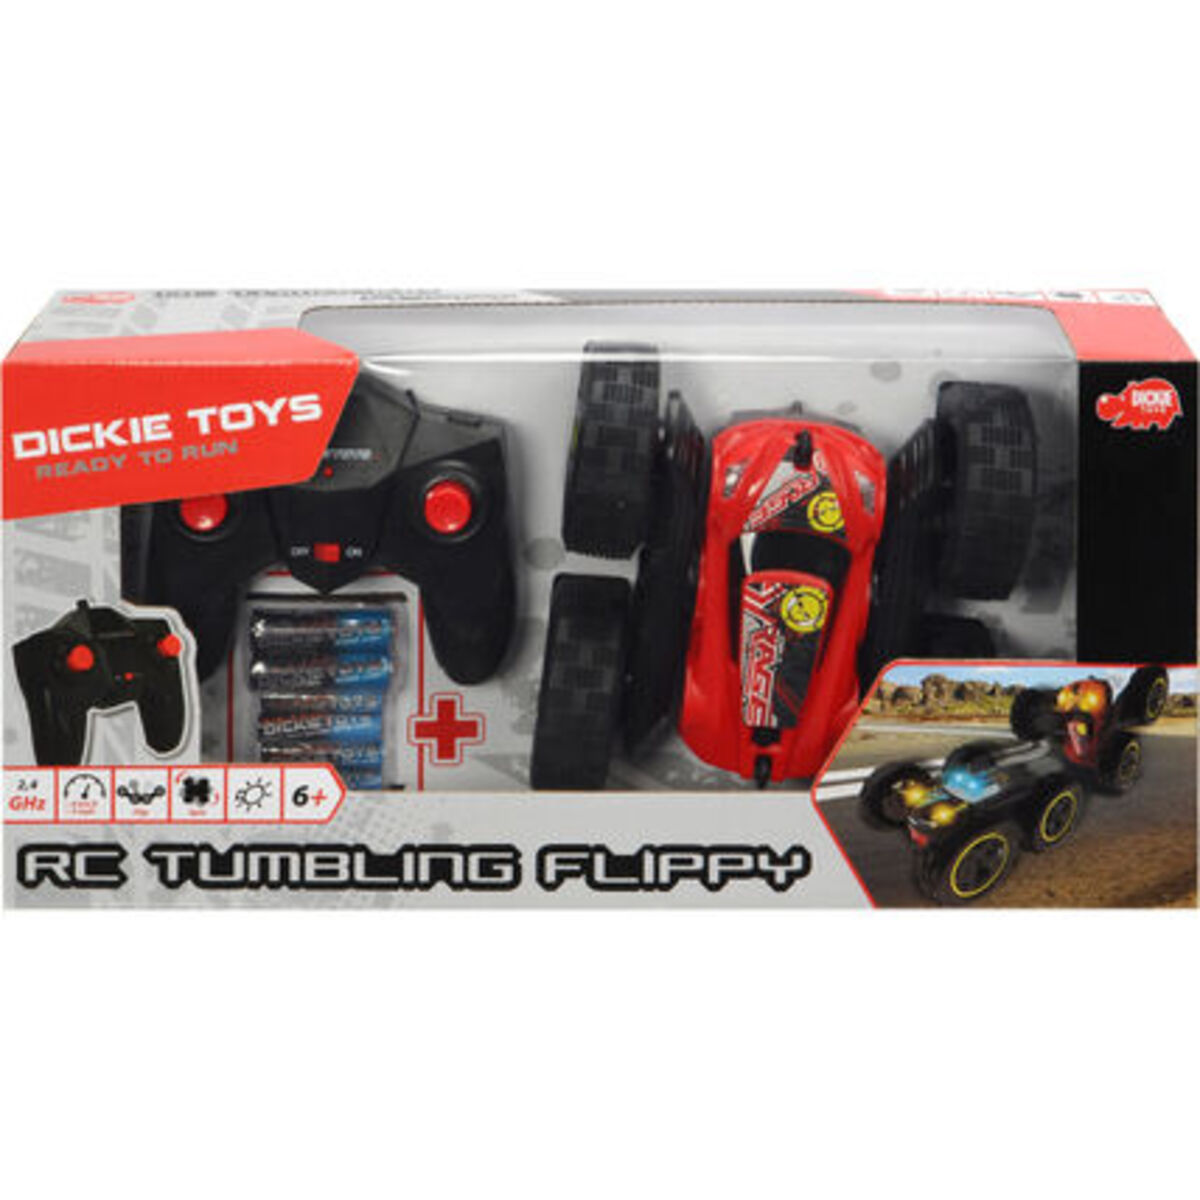 Bild 1 von Dickie Toys RC Tumbling Flippy